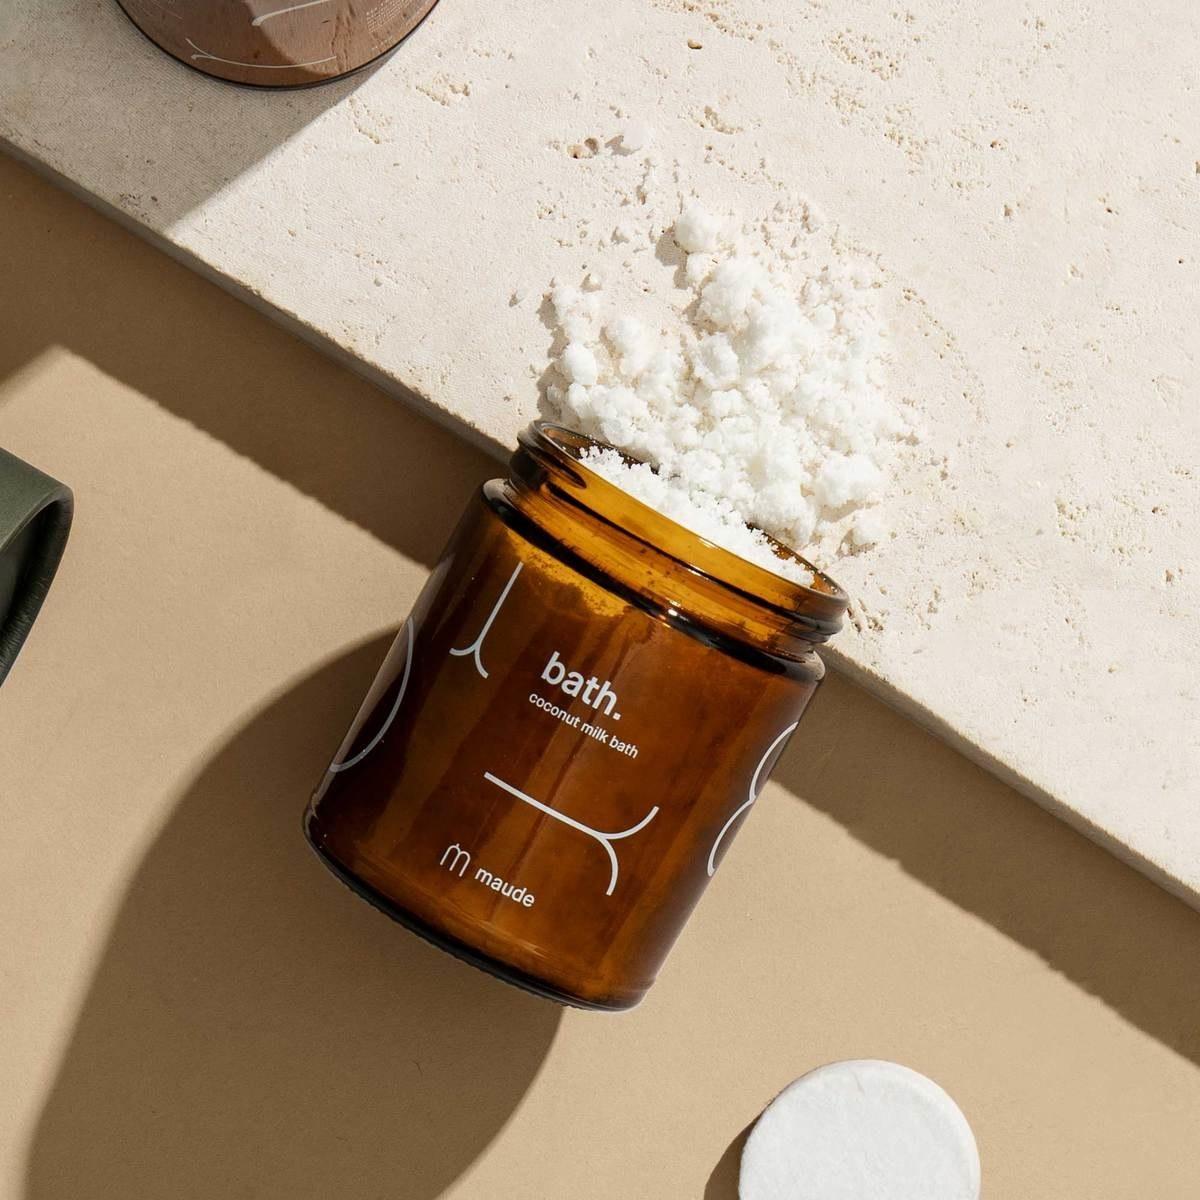 the coconut milk powder